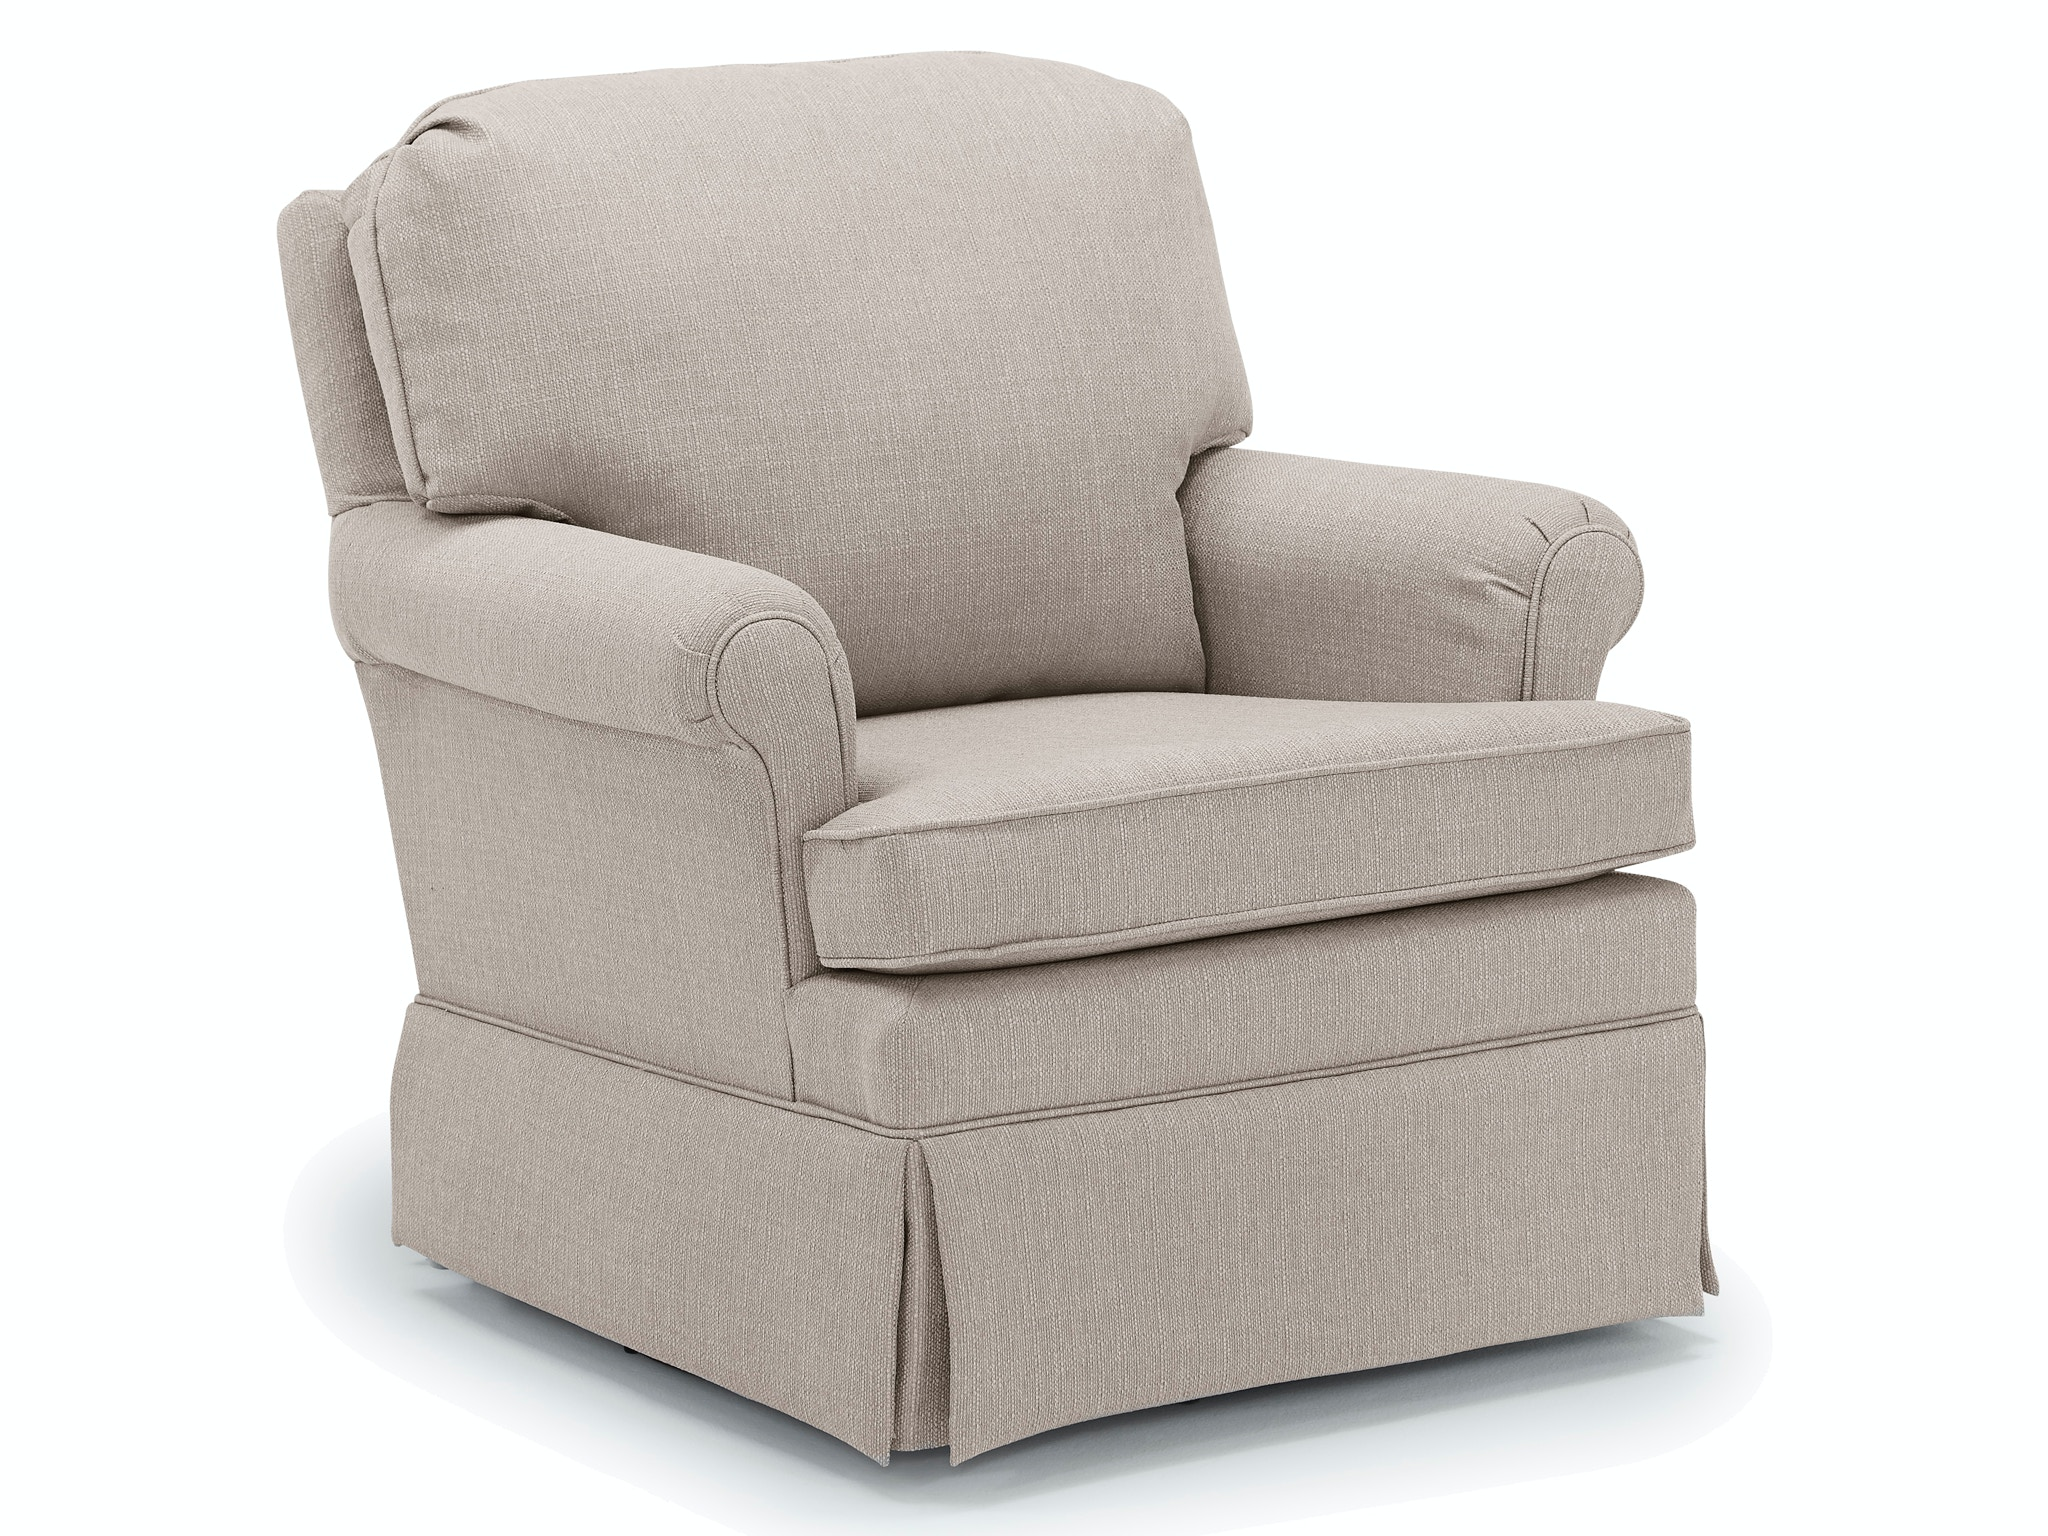 besthf com chairs front porch rocking patoka swivel rocker